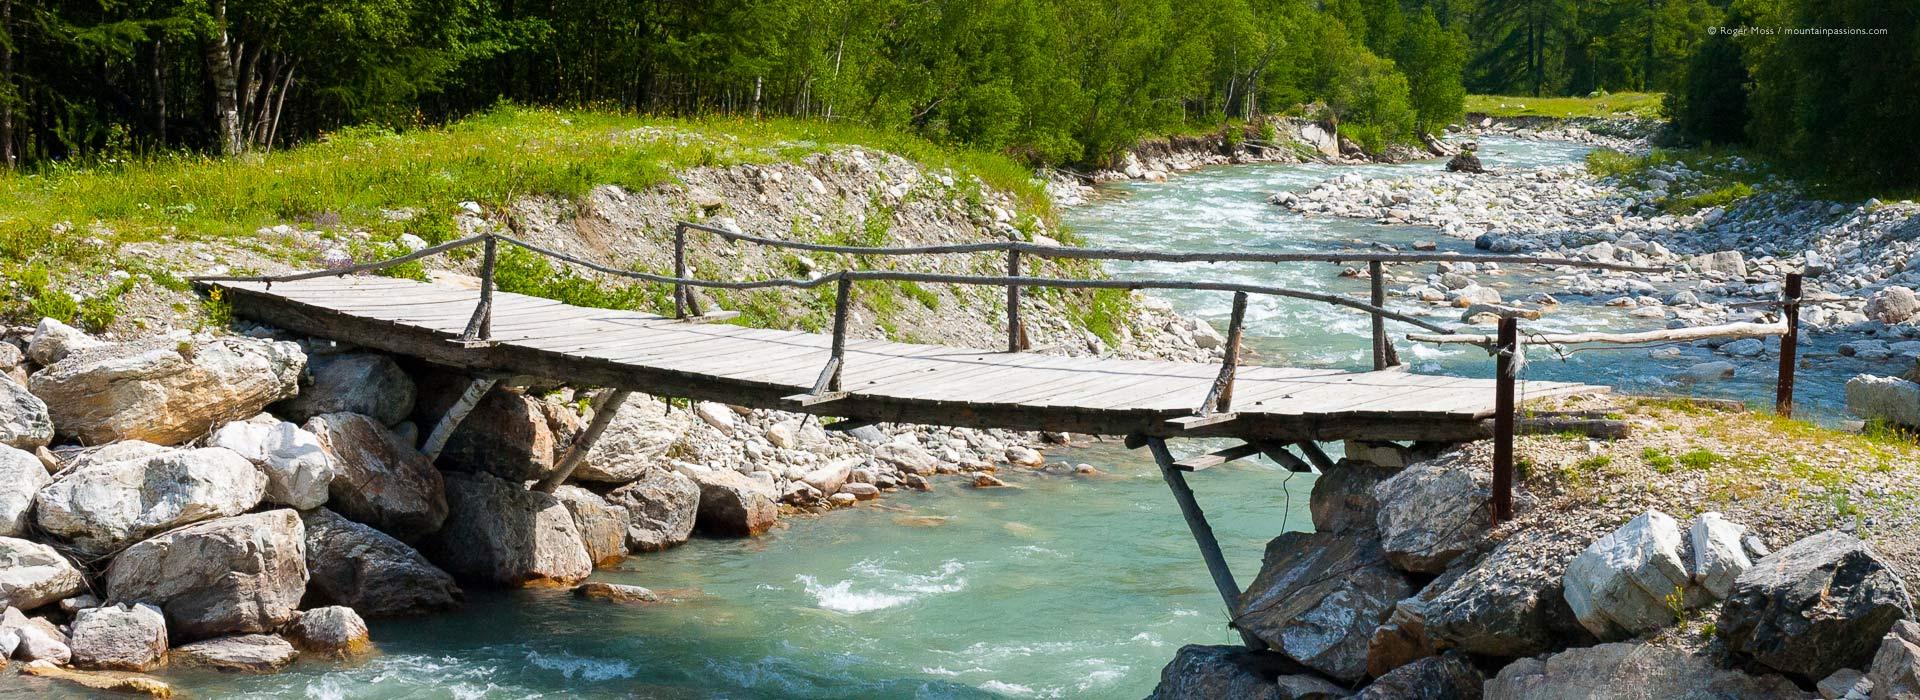 View of rustic wooden footbridge over mountain stream